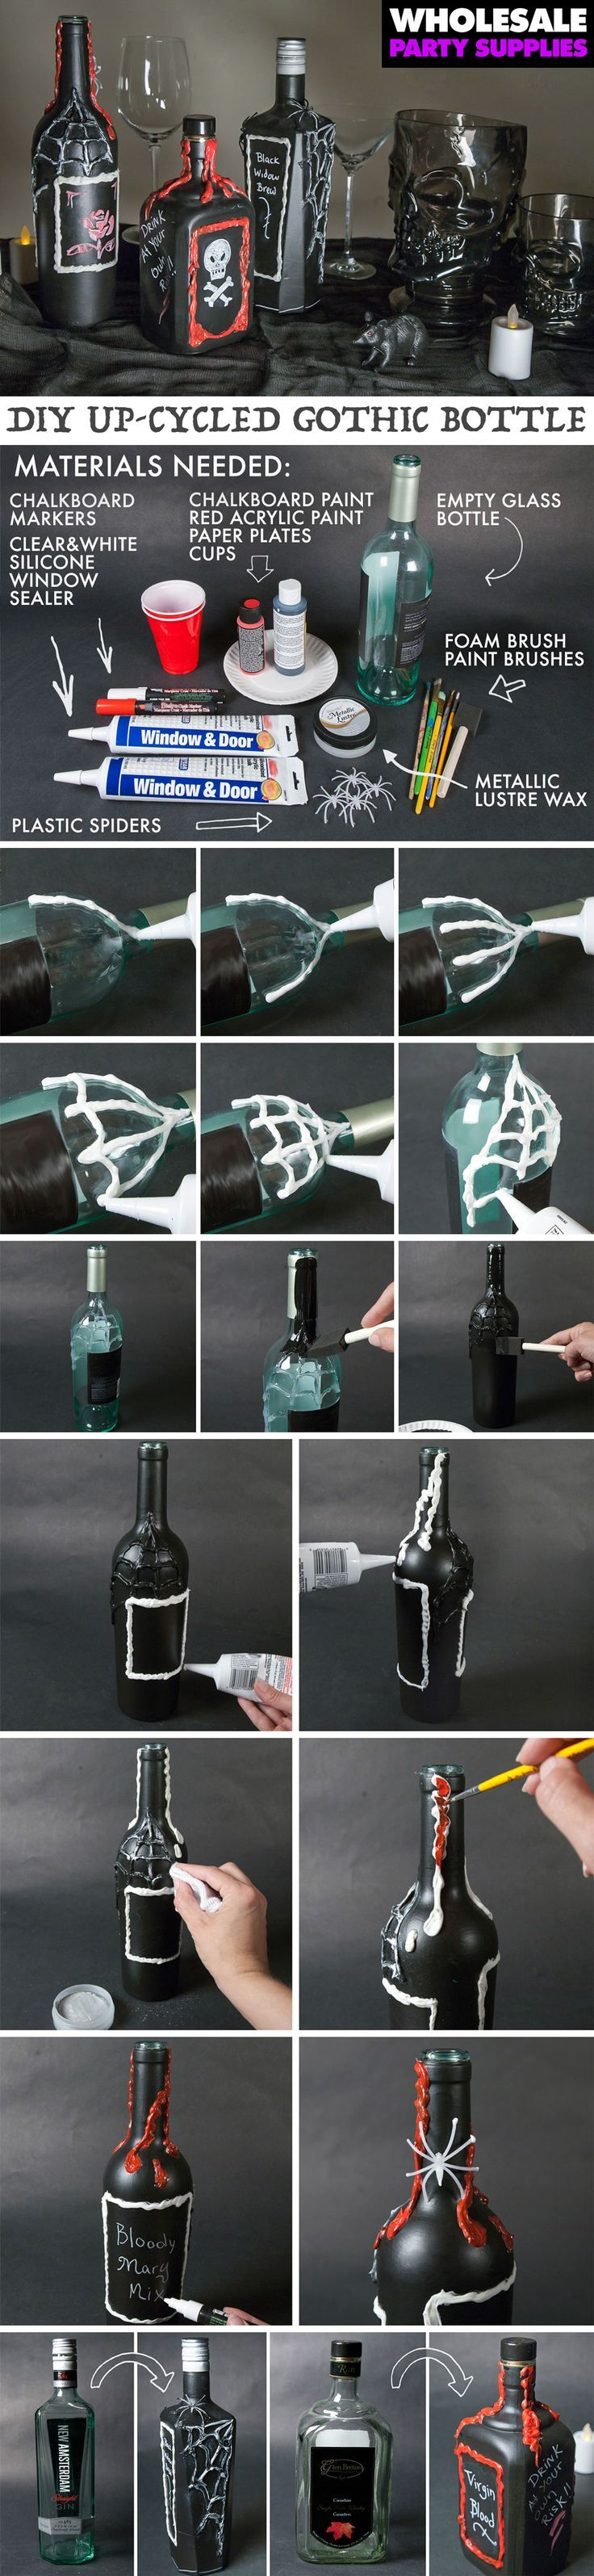 Photo of DIY Gothic Bottle Decorations